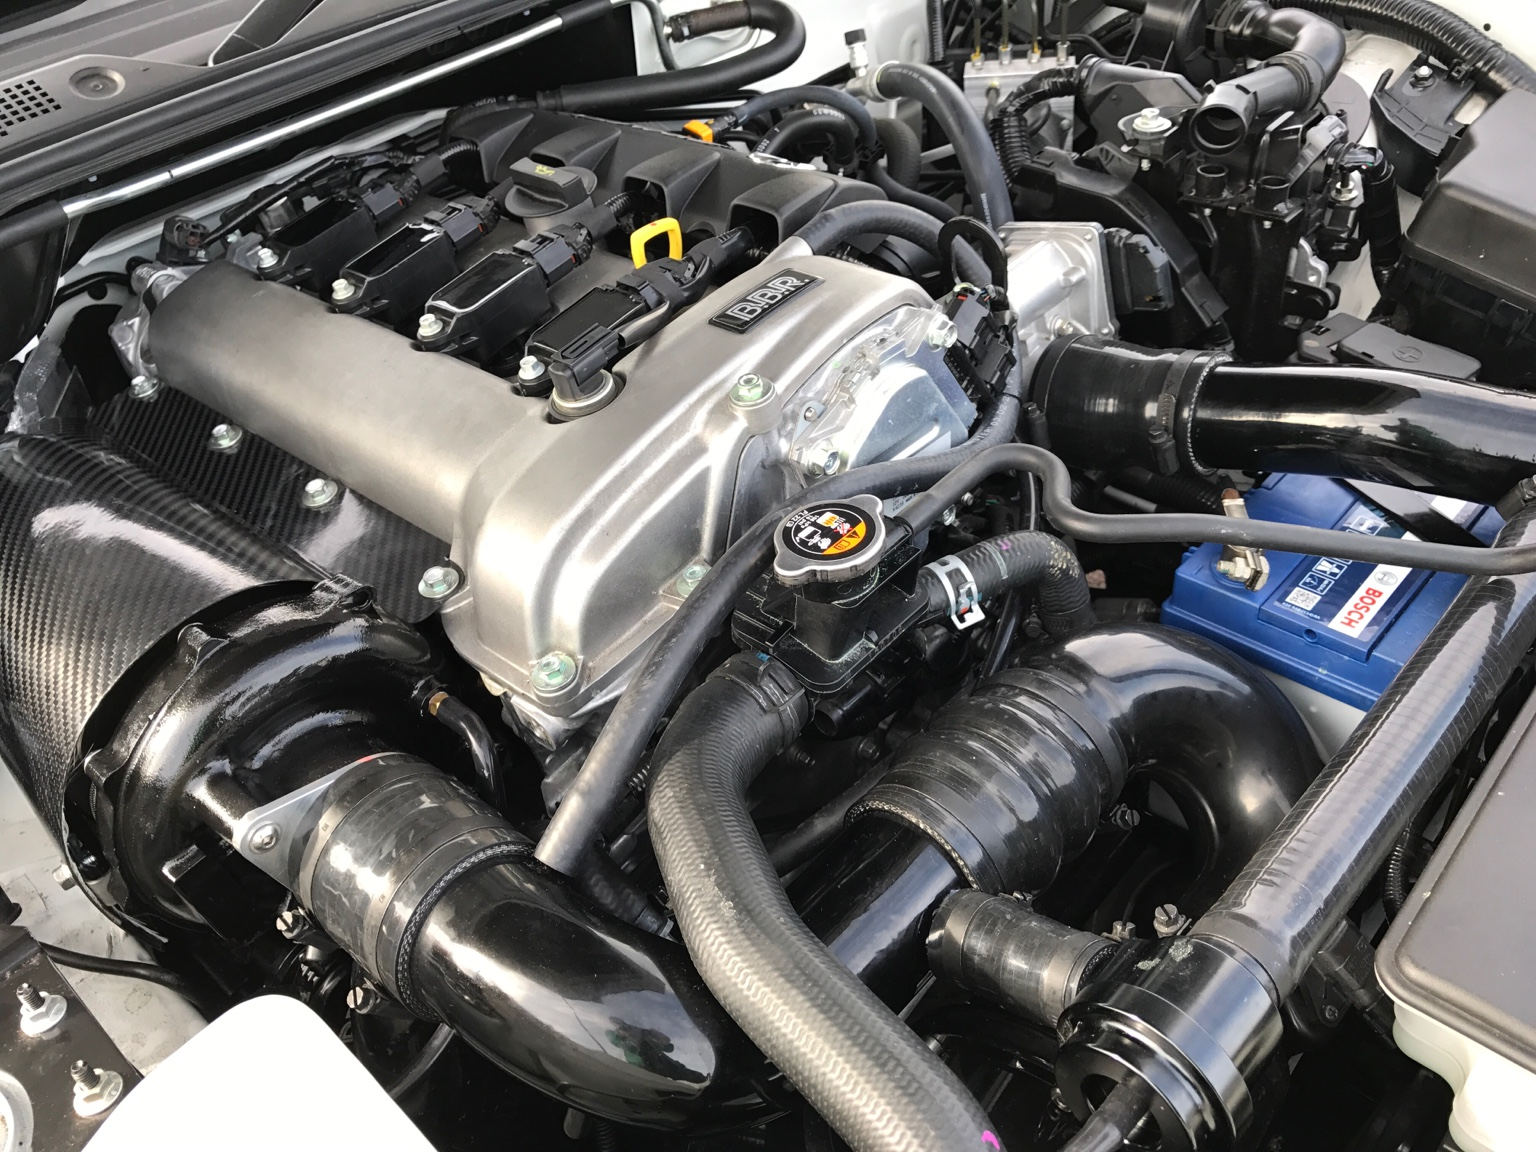 1 5 engine performance parts? - MX-5 Miata Forum